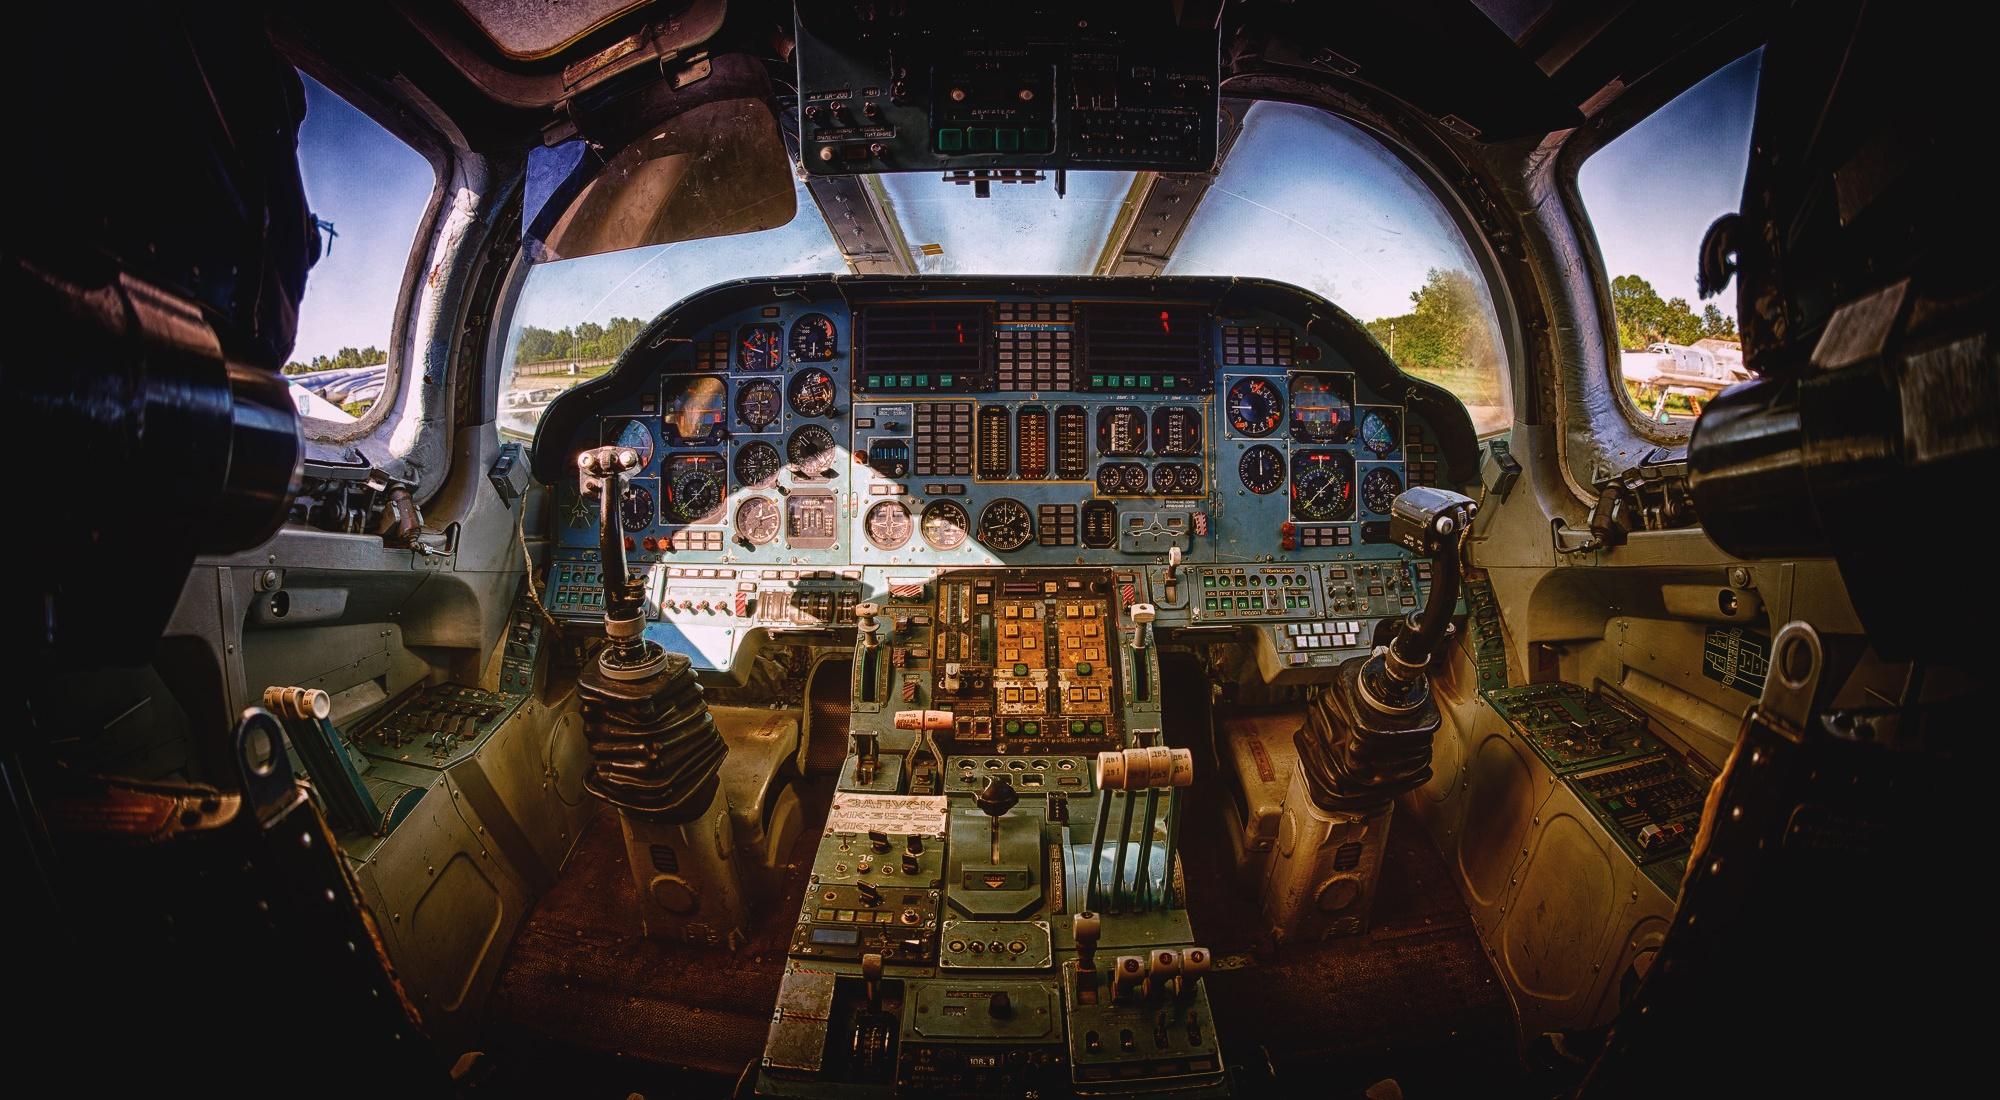 Wallpaper Cockpit Aircraft Vehicle 2000x1100 Wallpapermaniac 1475083 Hd Wallpapers Wallhere